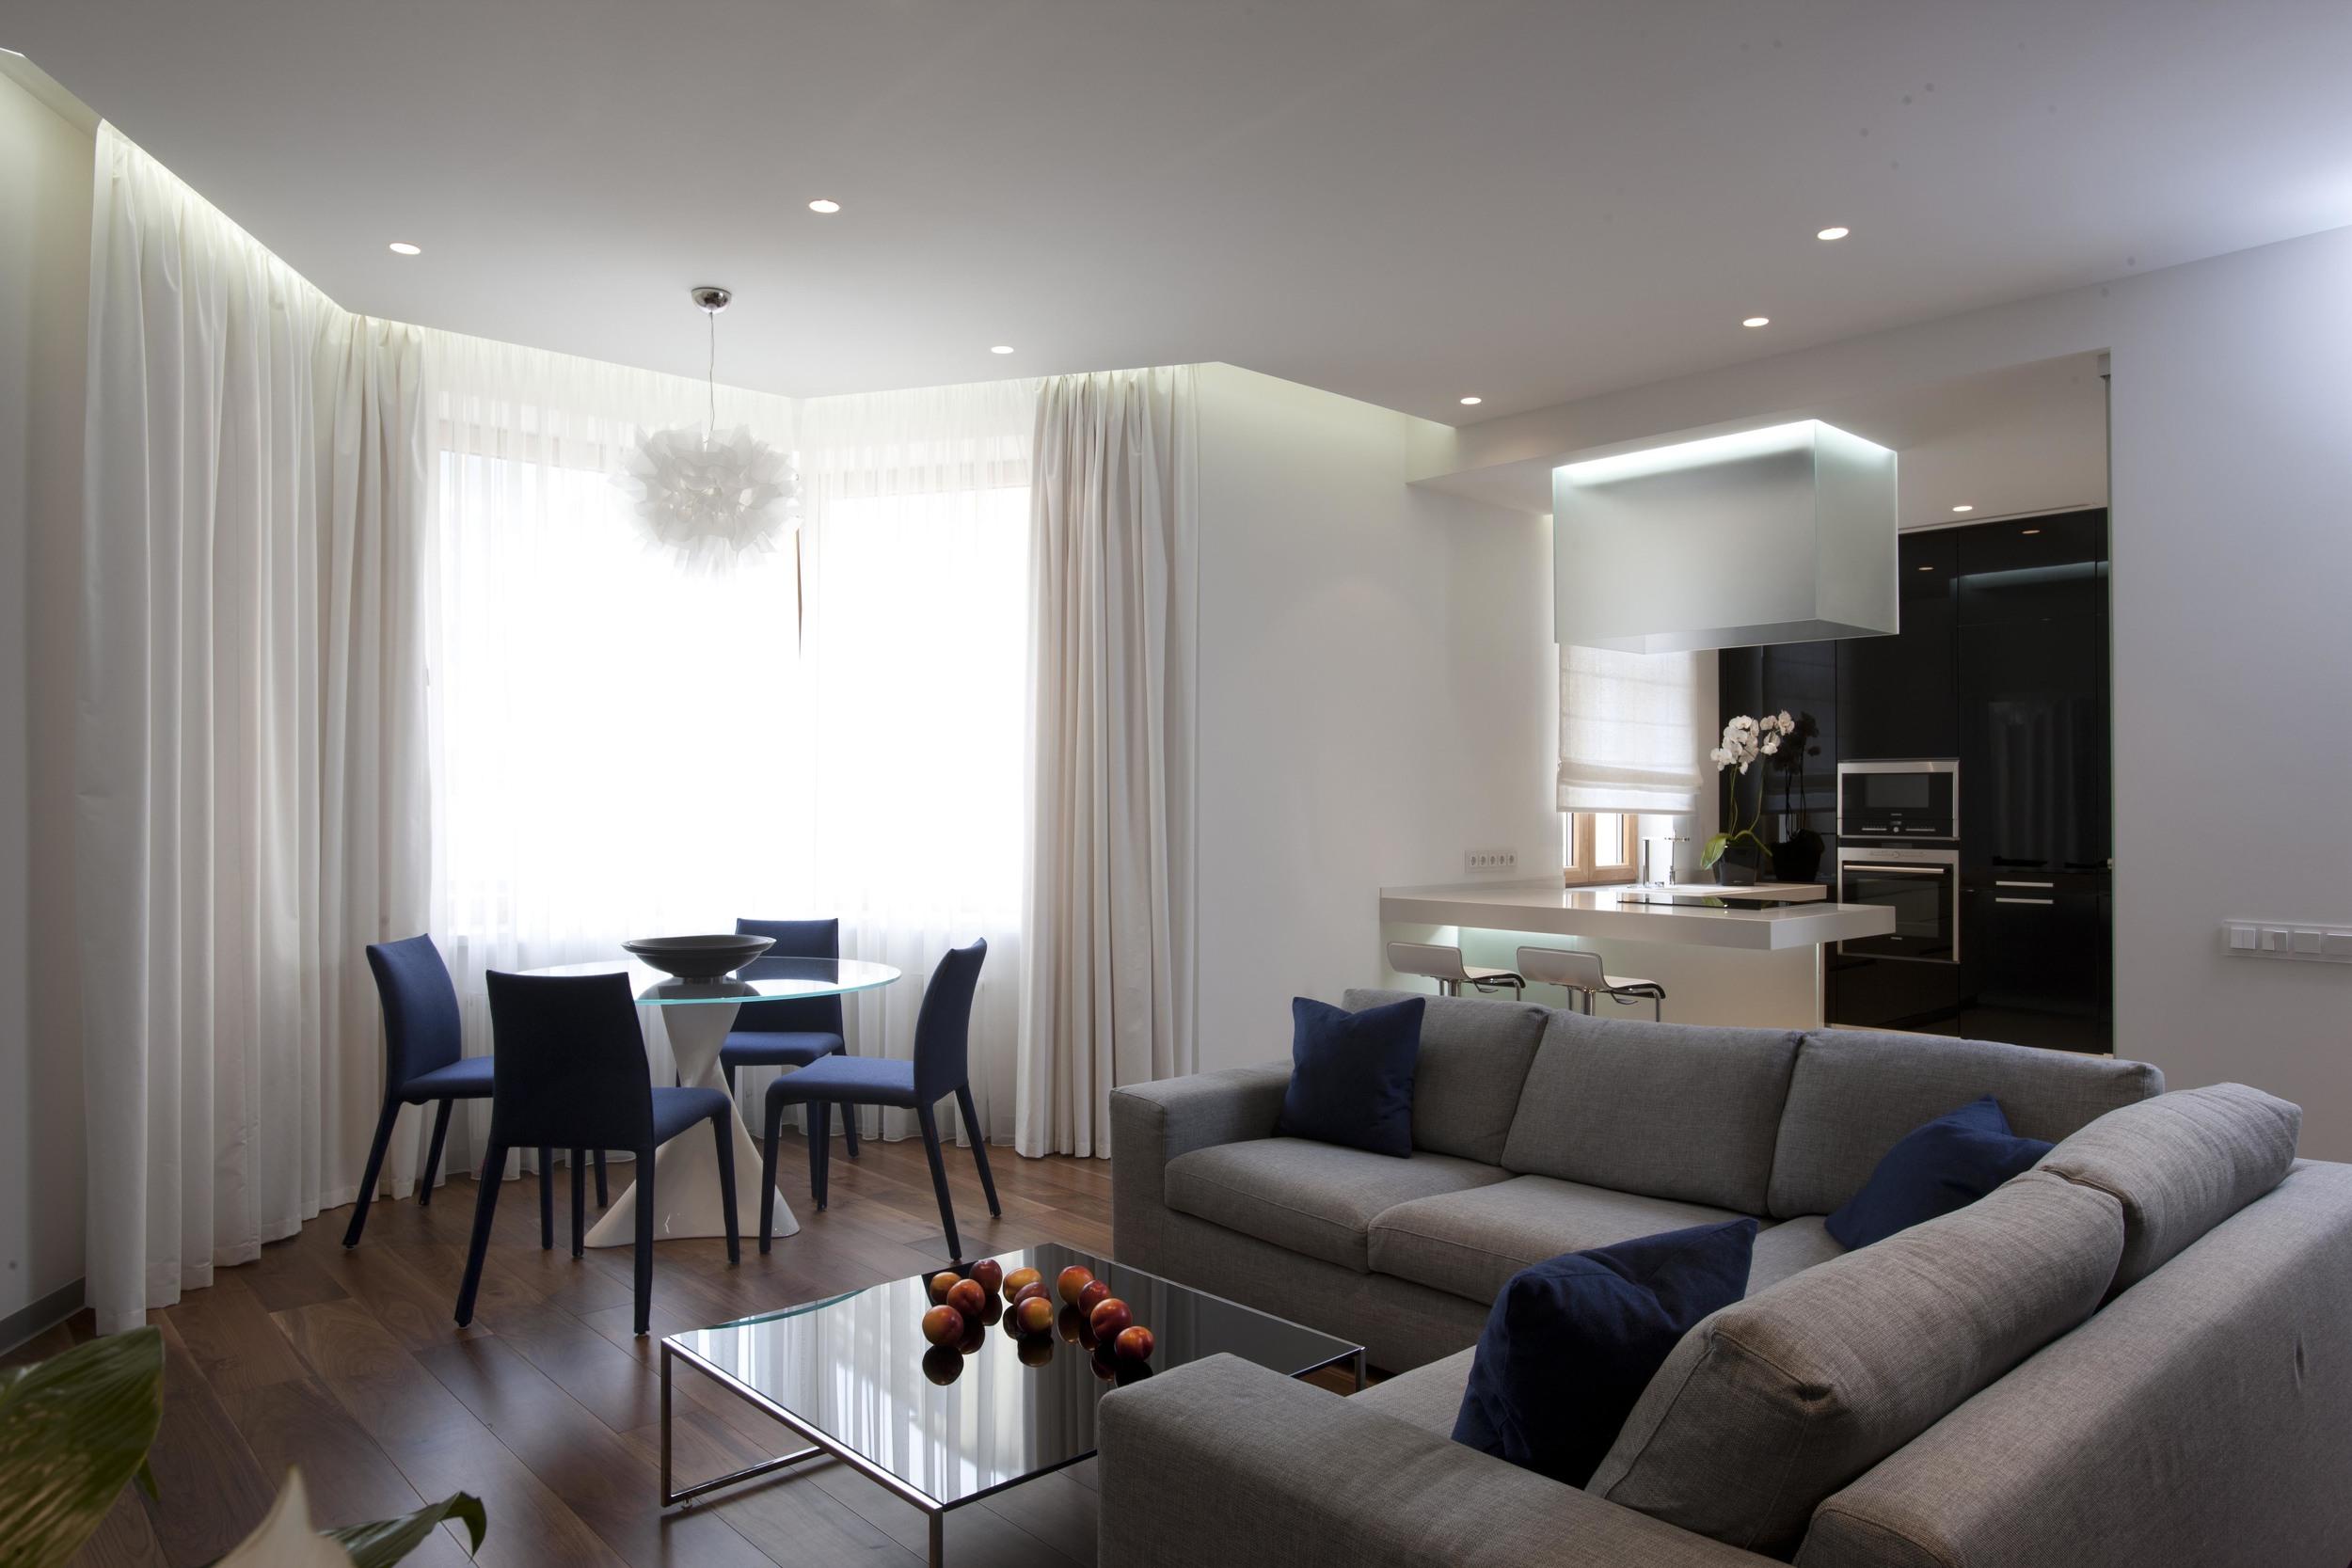 02_ub_pechatnikov3_livingroom_2.jpg